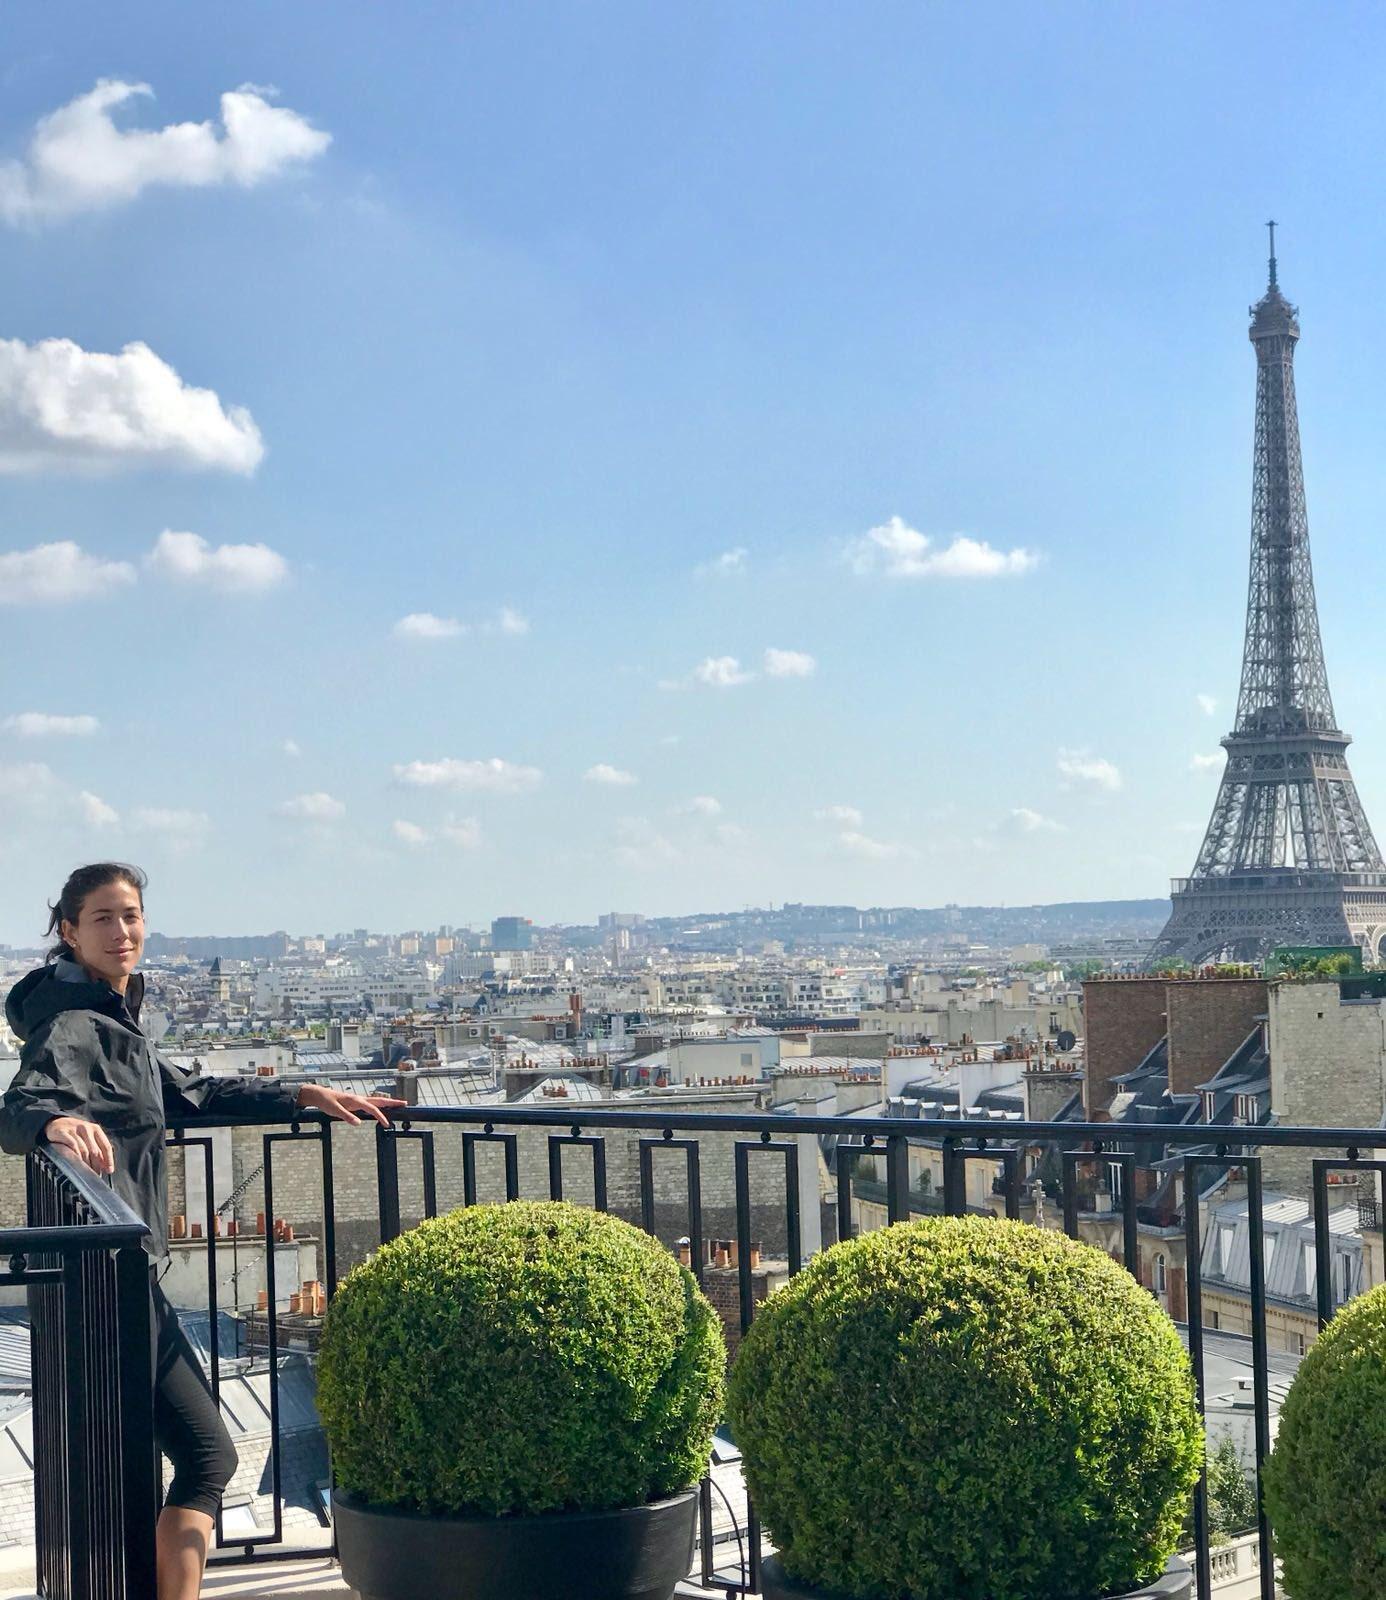 Merci Paris! Merci @rolandgarros!  Thanks @FSParis for making me feel like home. Nos vemos el año que viene! �� https://t.co/GEWuMqdR25